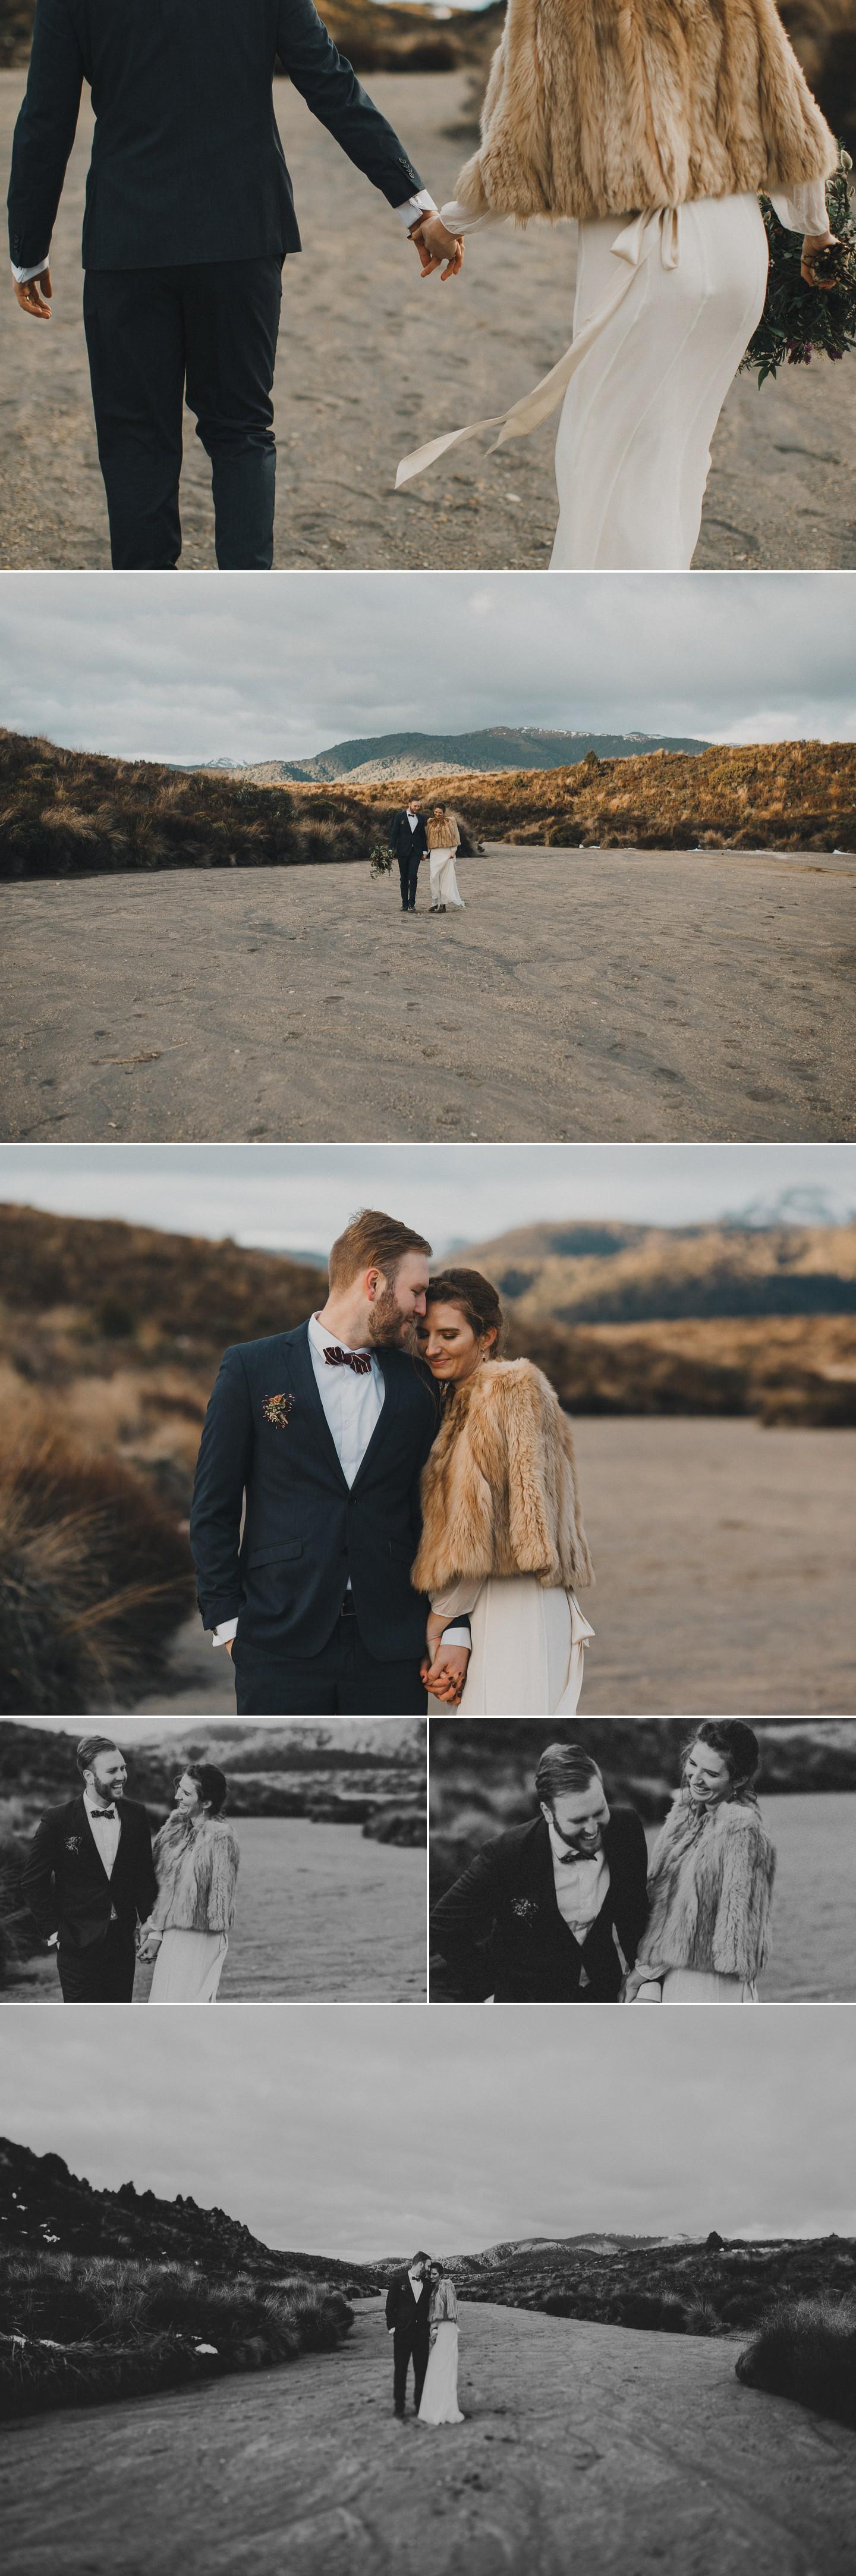 Pre-wedding photos in New Zealand